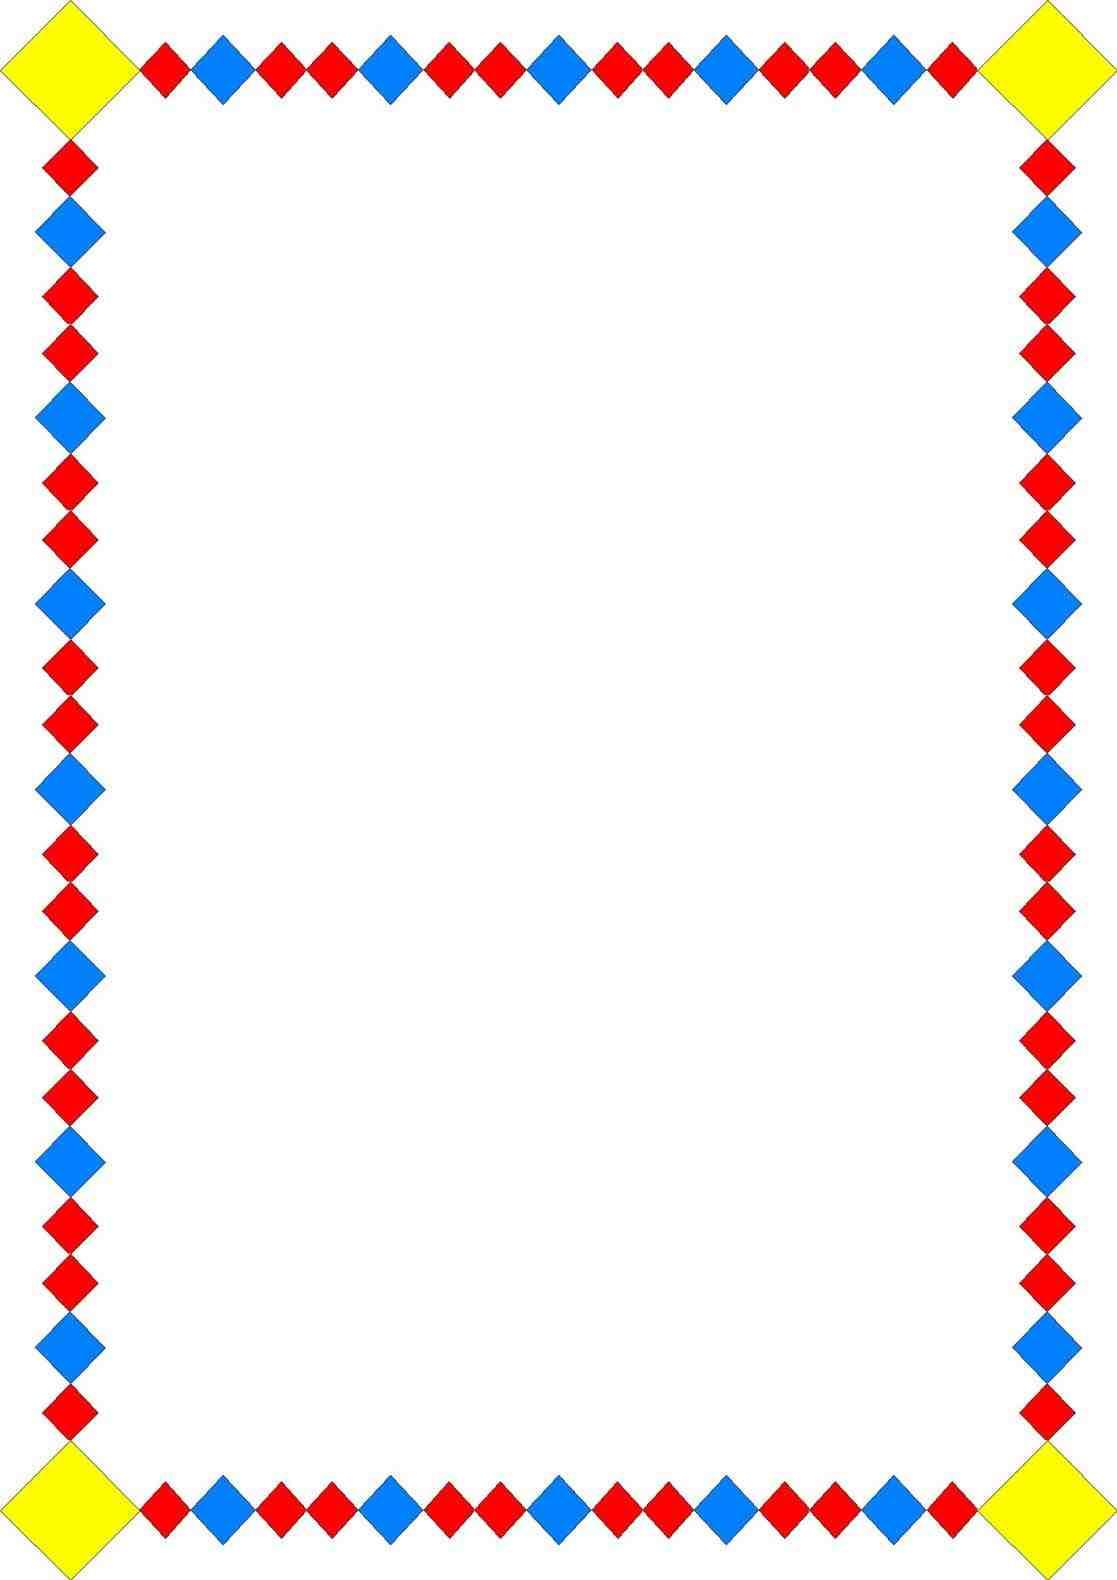 1117x1580 Pdf Jpg Png Border Formats Free Christmas Clipart